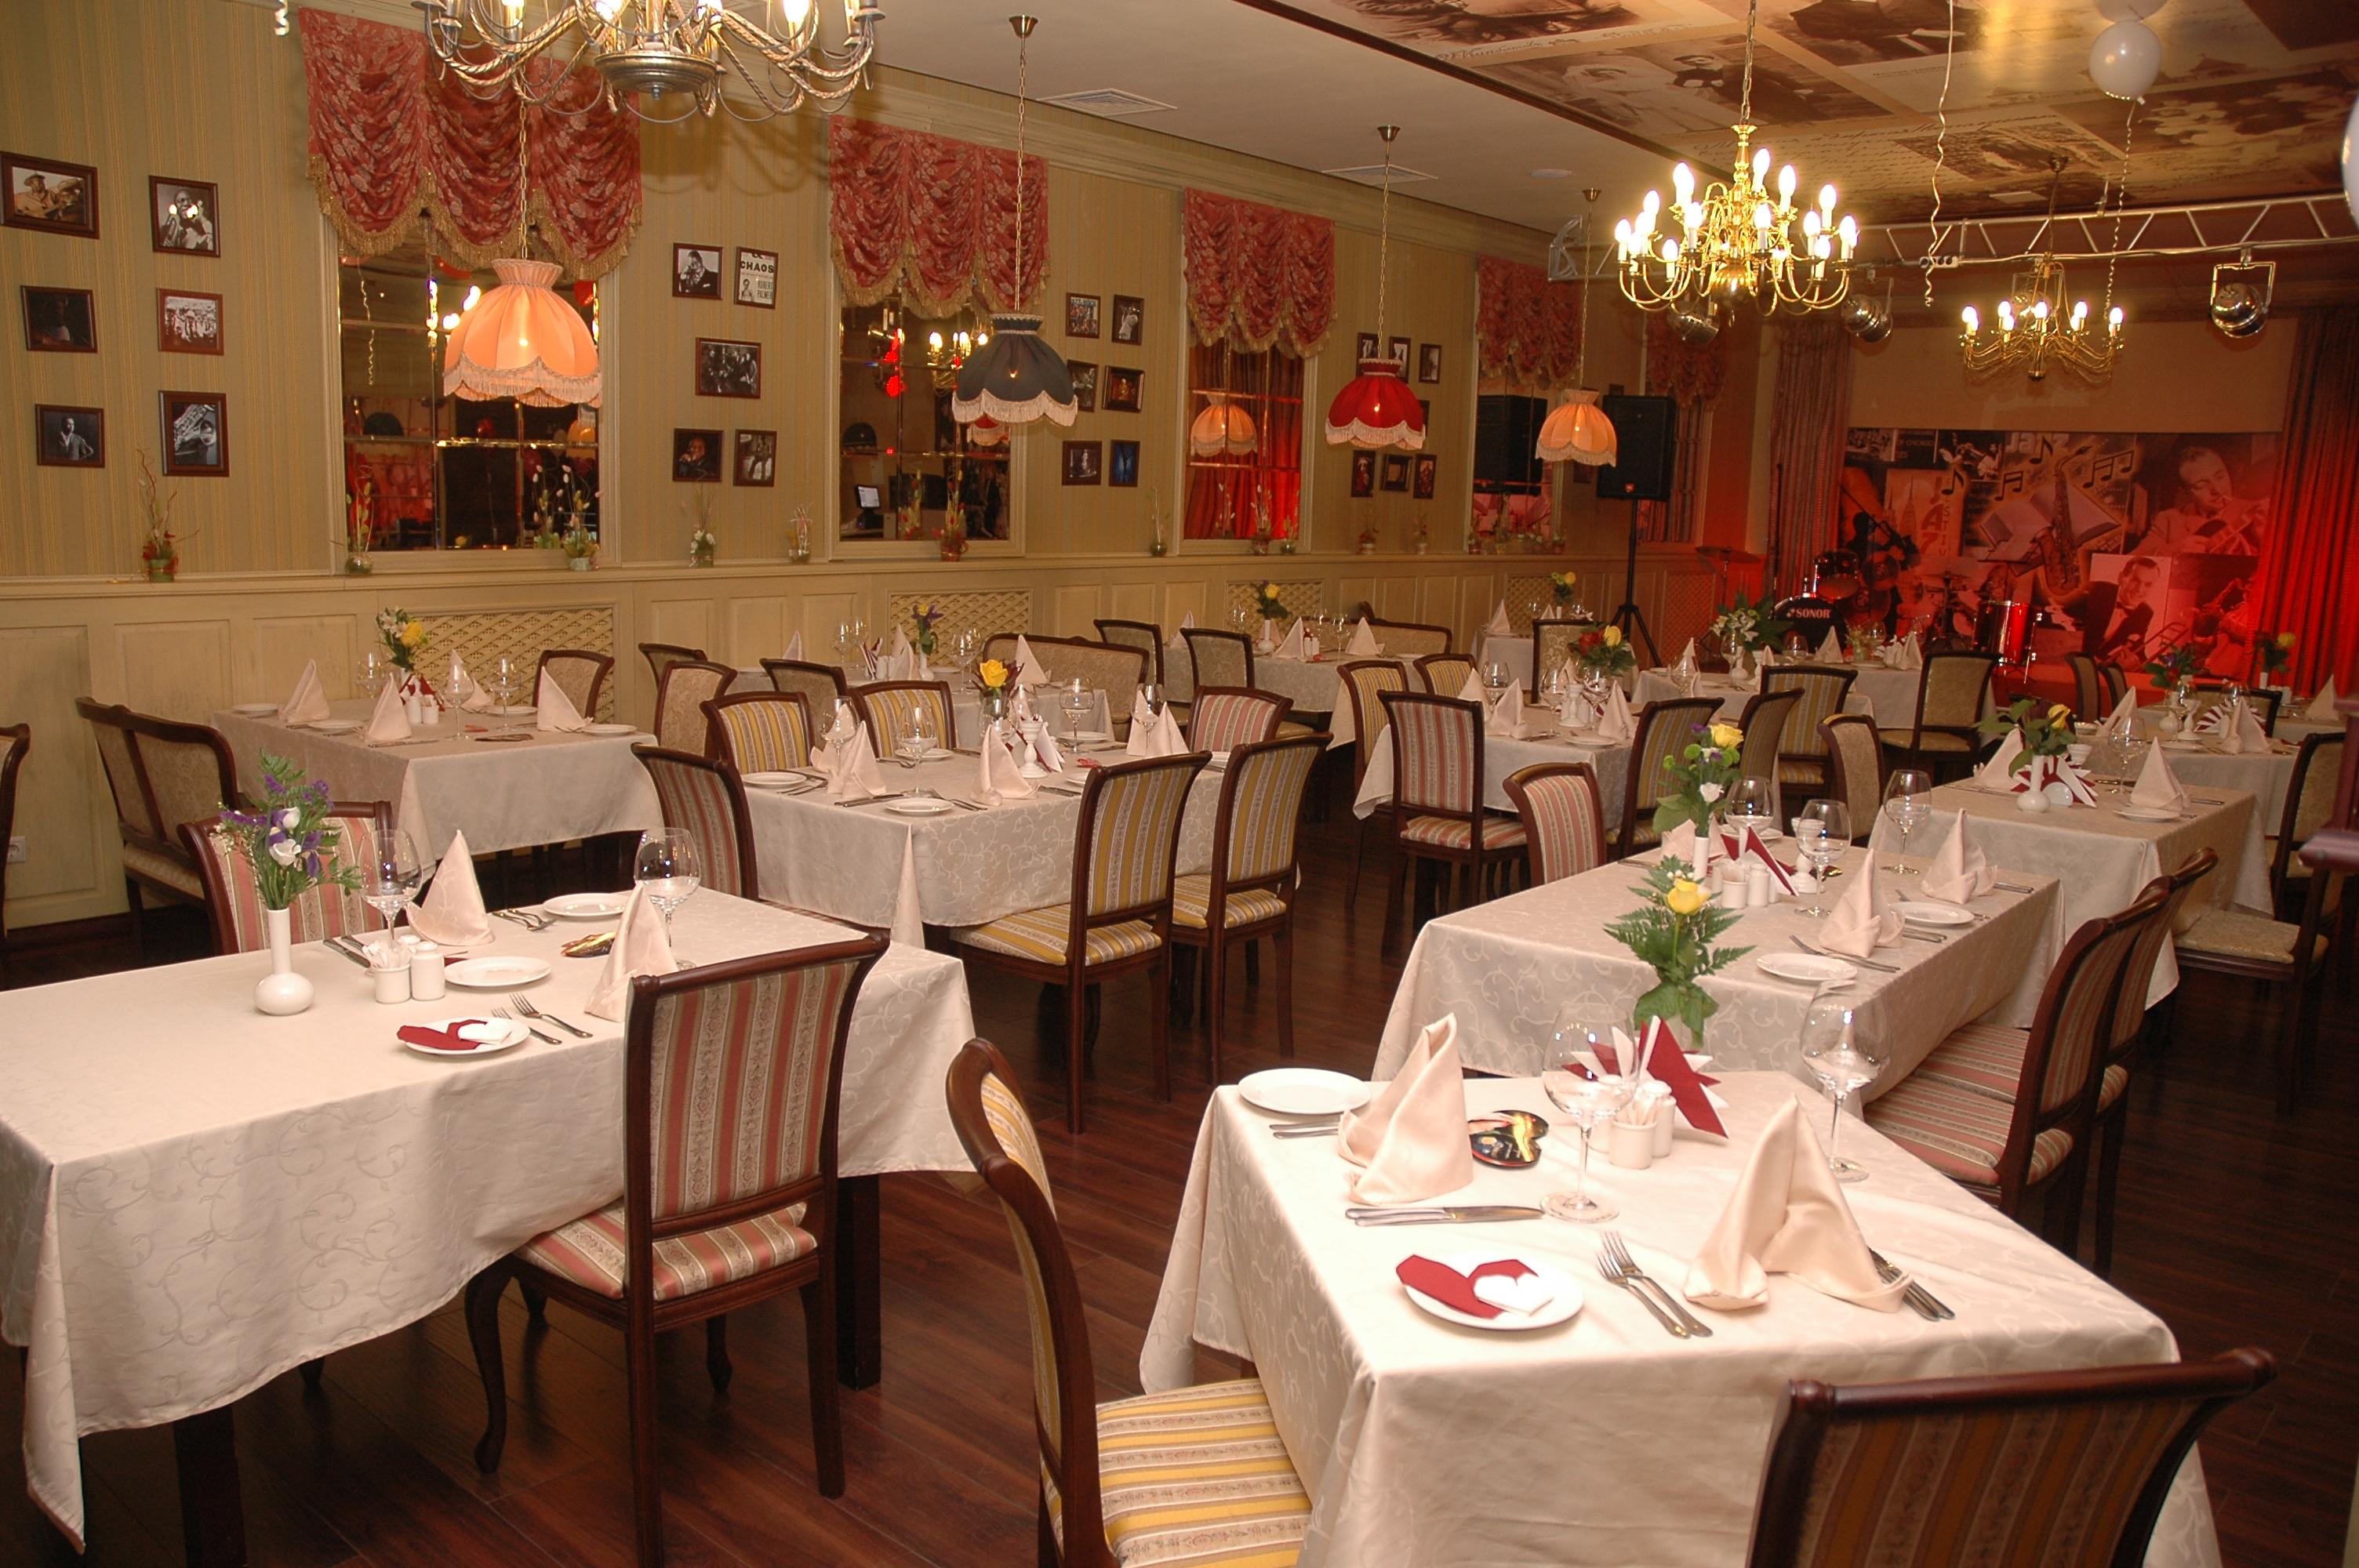 Фотография: Ресторан Перекресток джаза